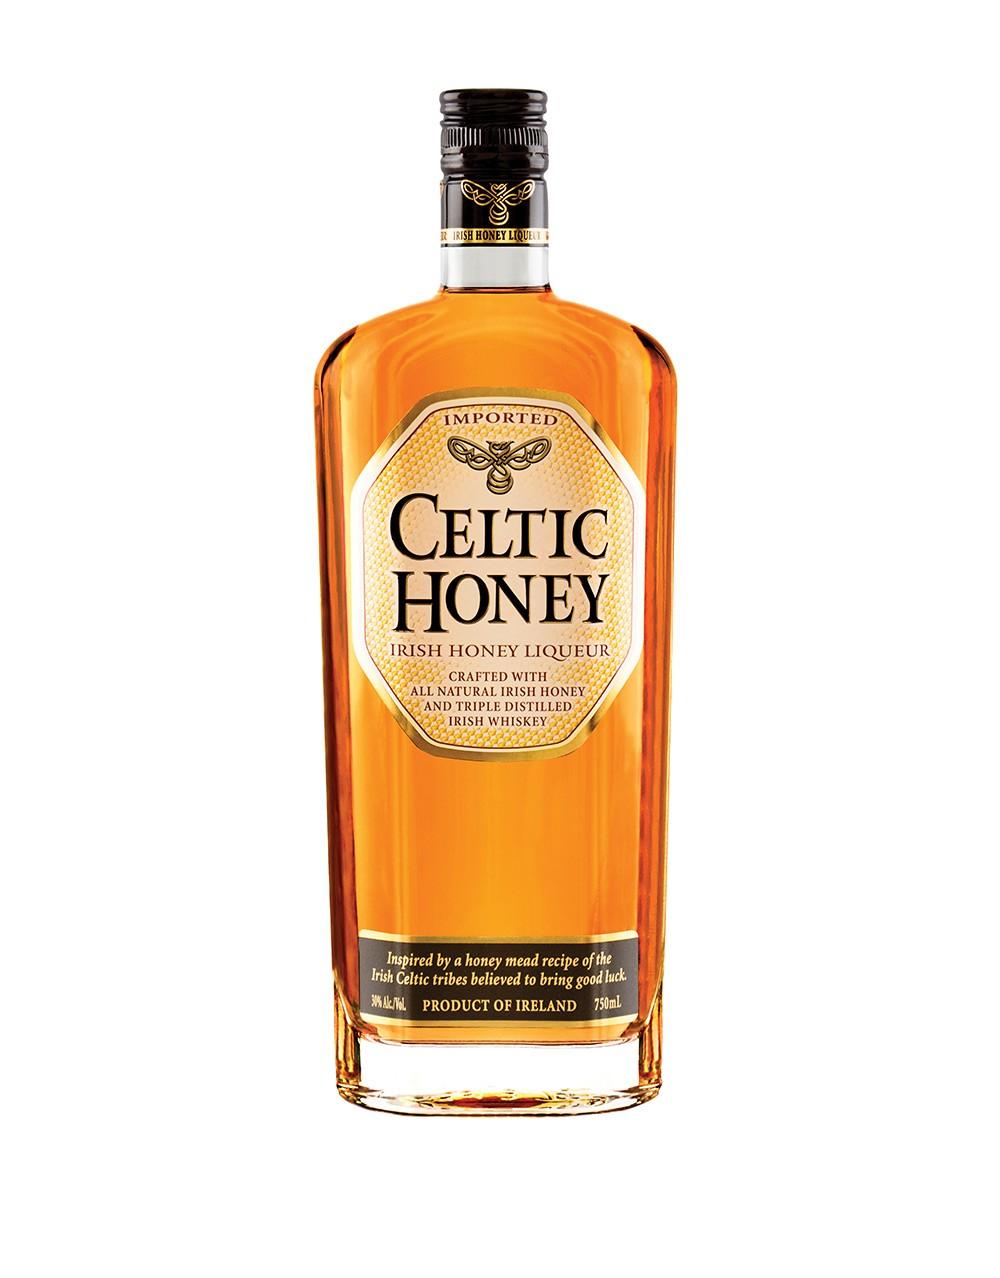 Celtic Honey Liqueur Buy Online Or Send As A Gift